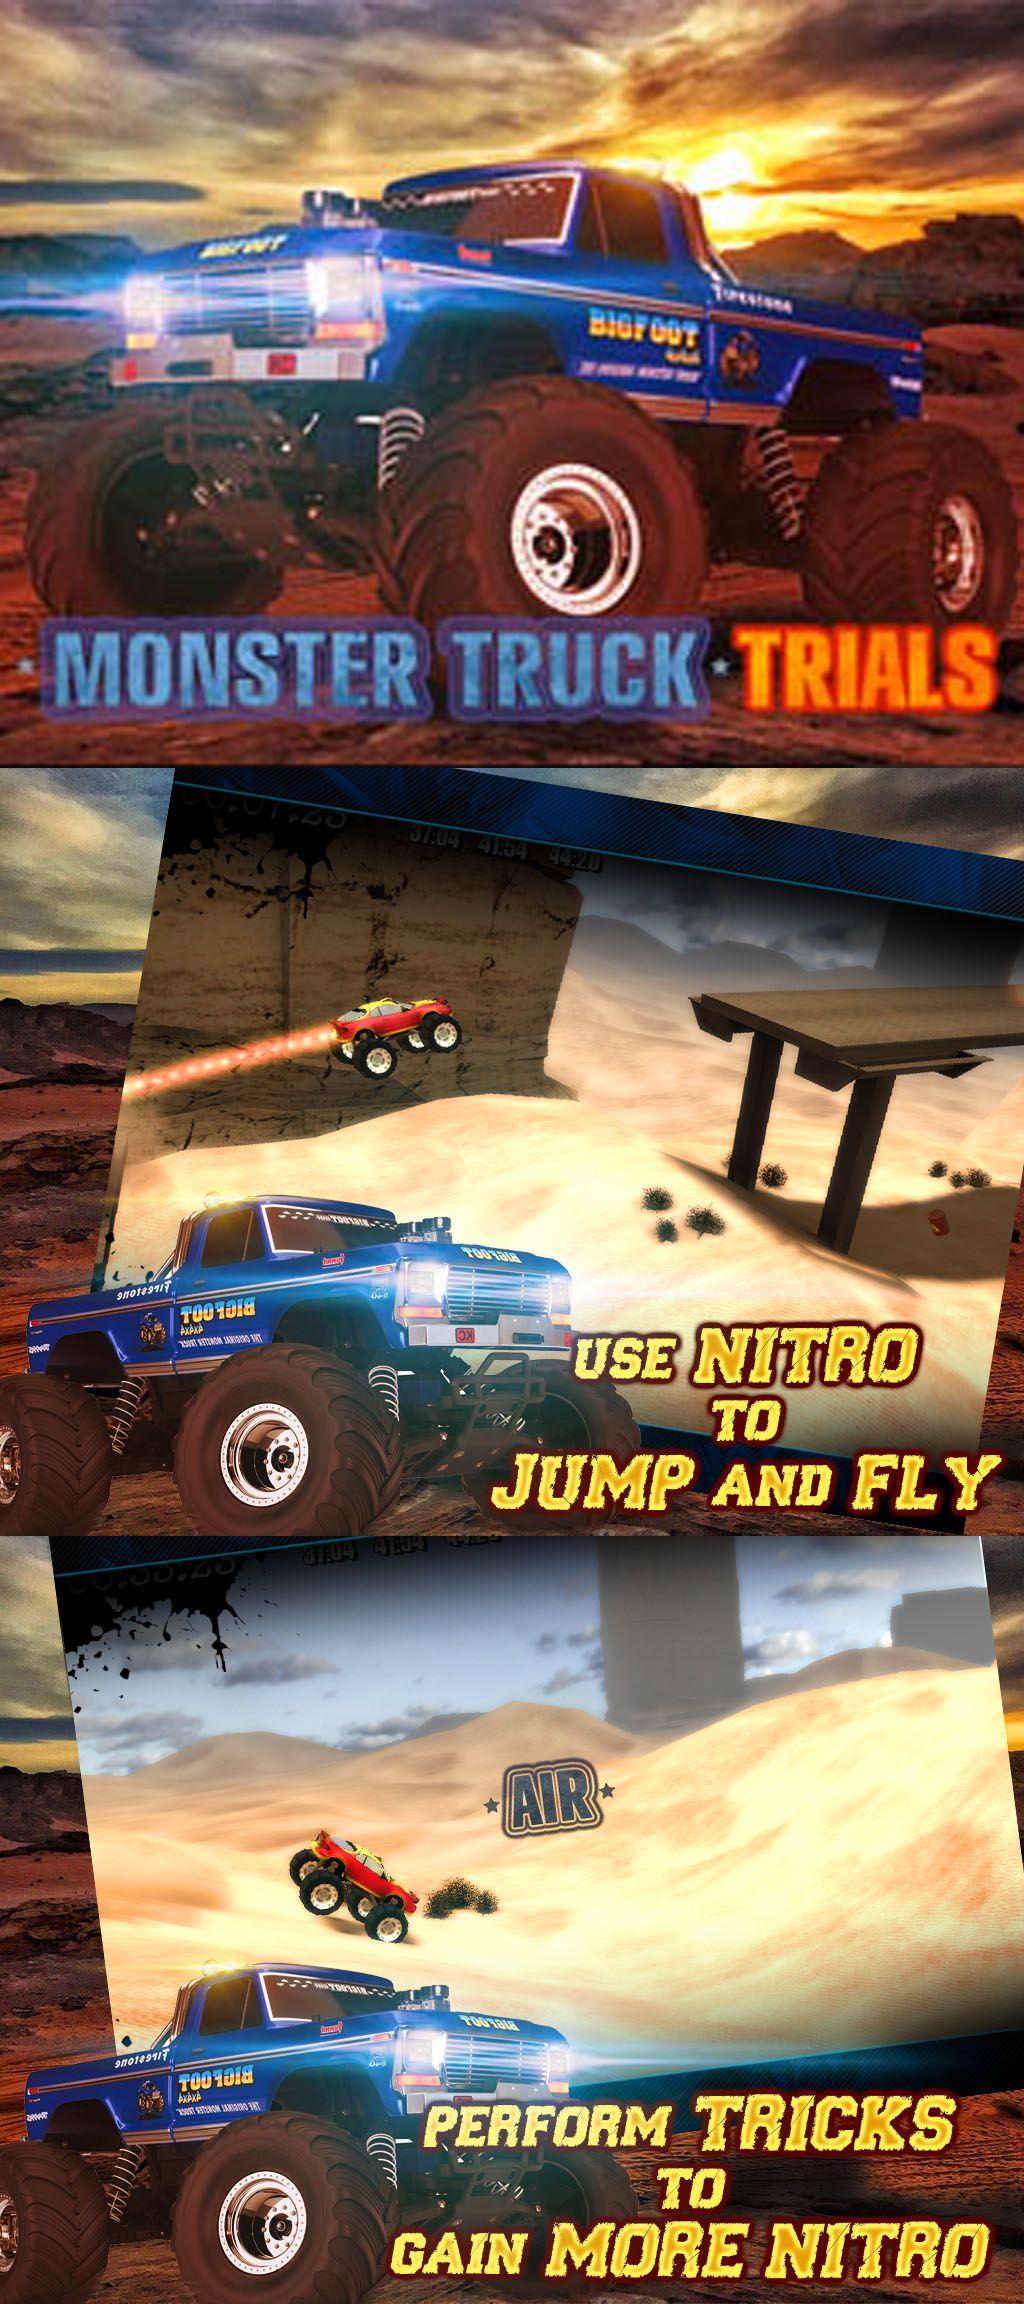 Monster Truck Trials Game Downloads Great In 2018 Pinterest